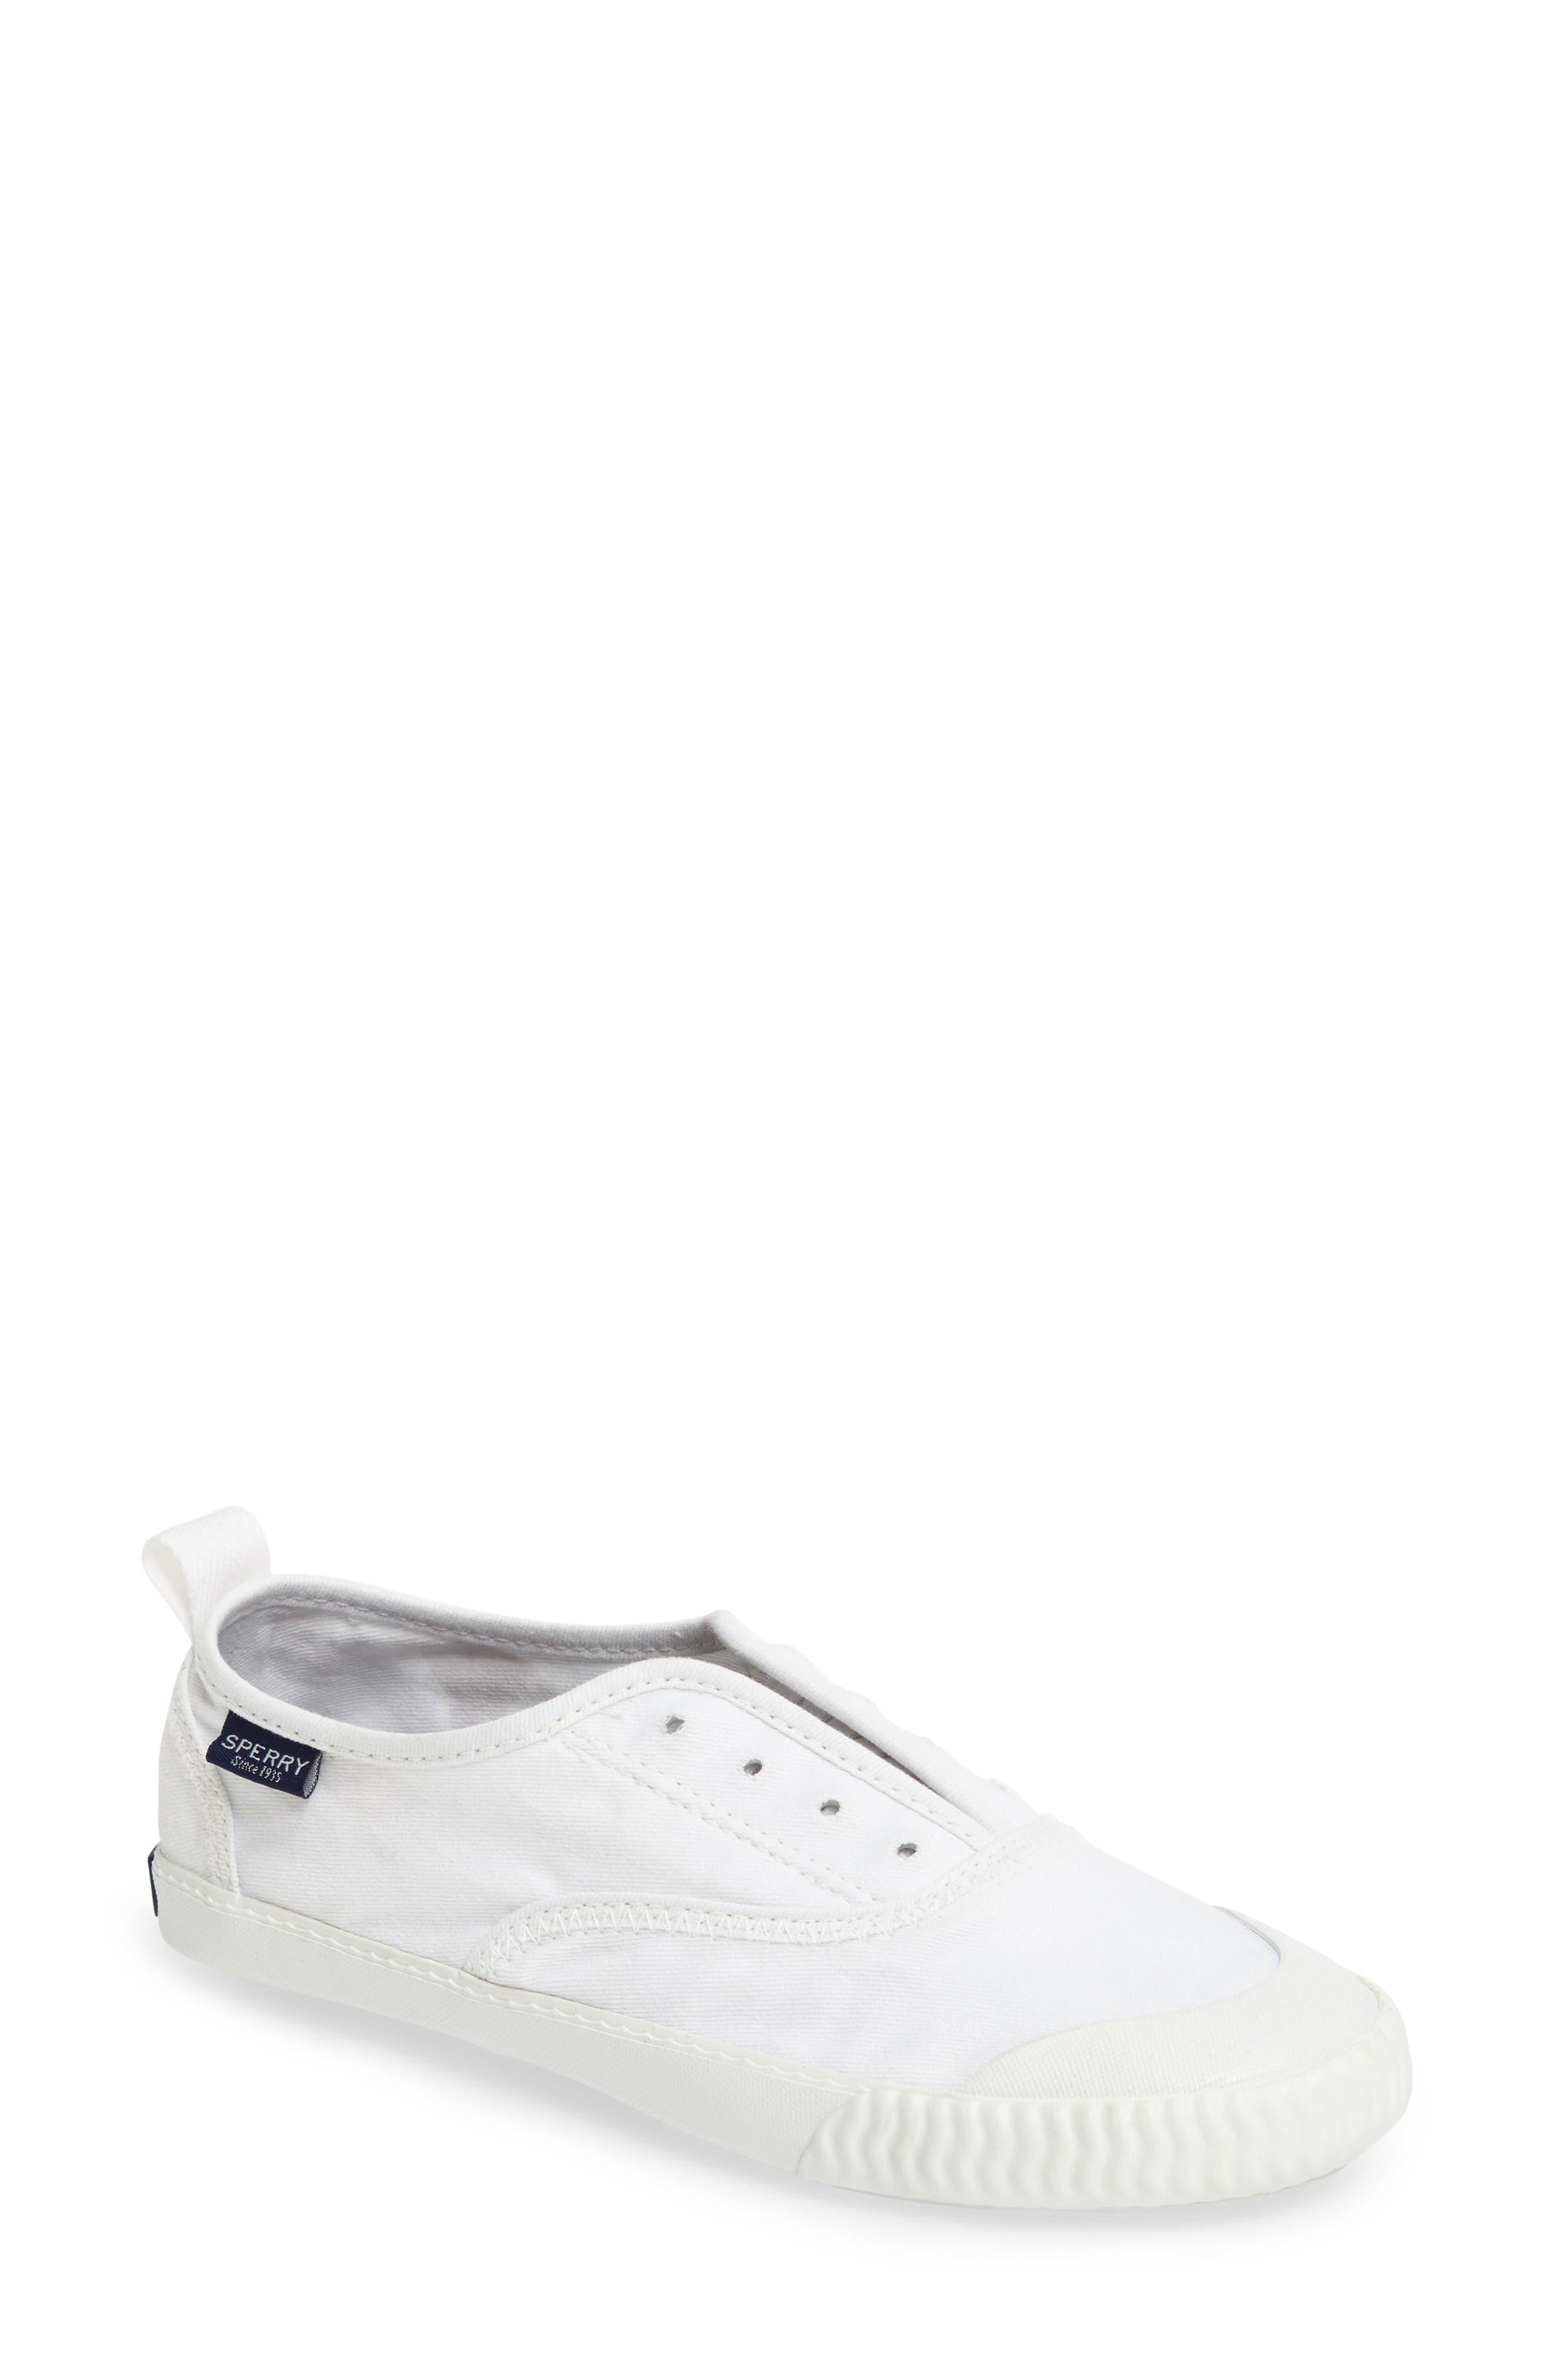 Sayel Slip-On Sneaker,                             Main thumbnail 1, color,                             White Fabric